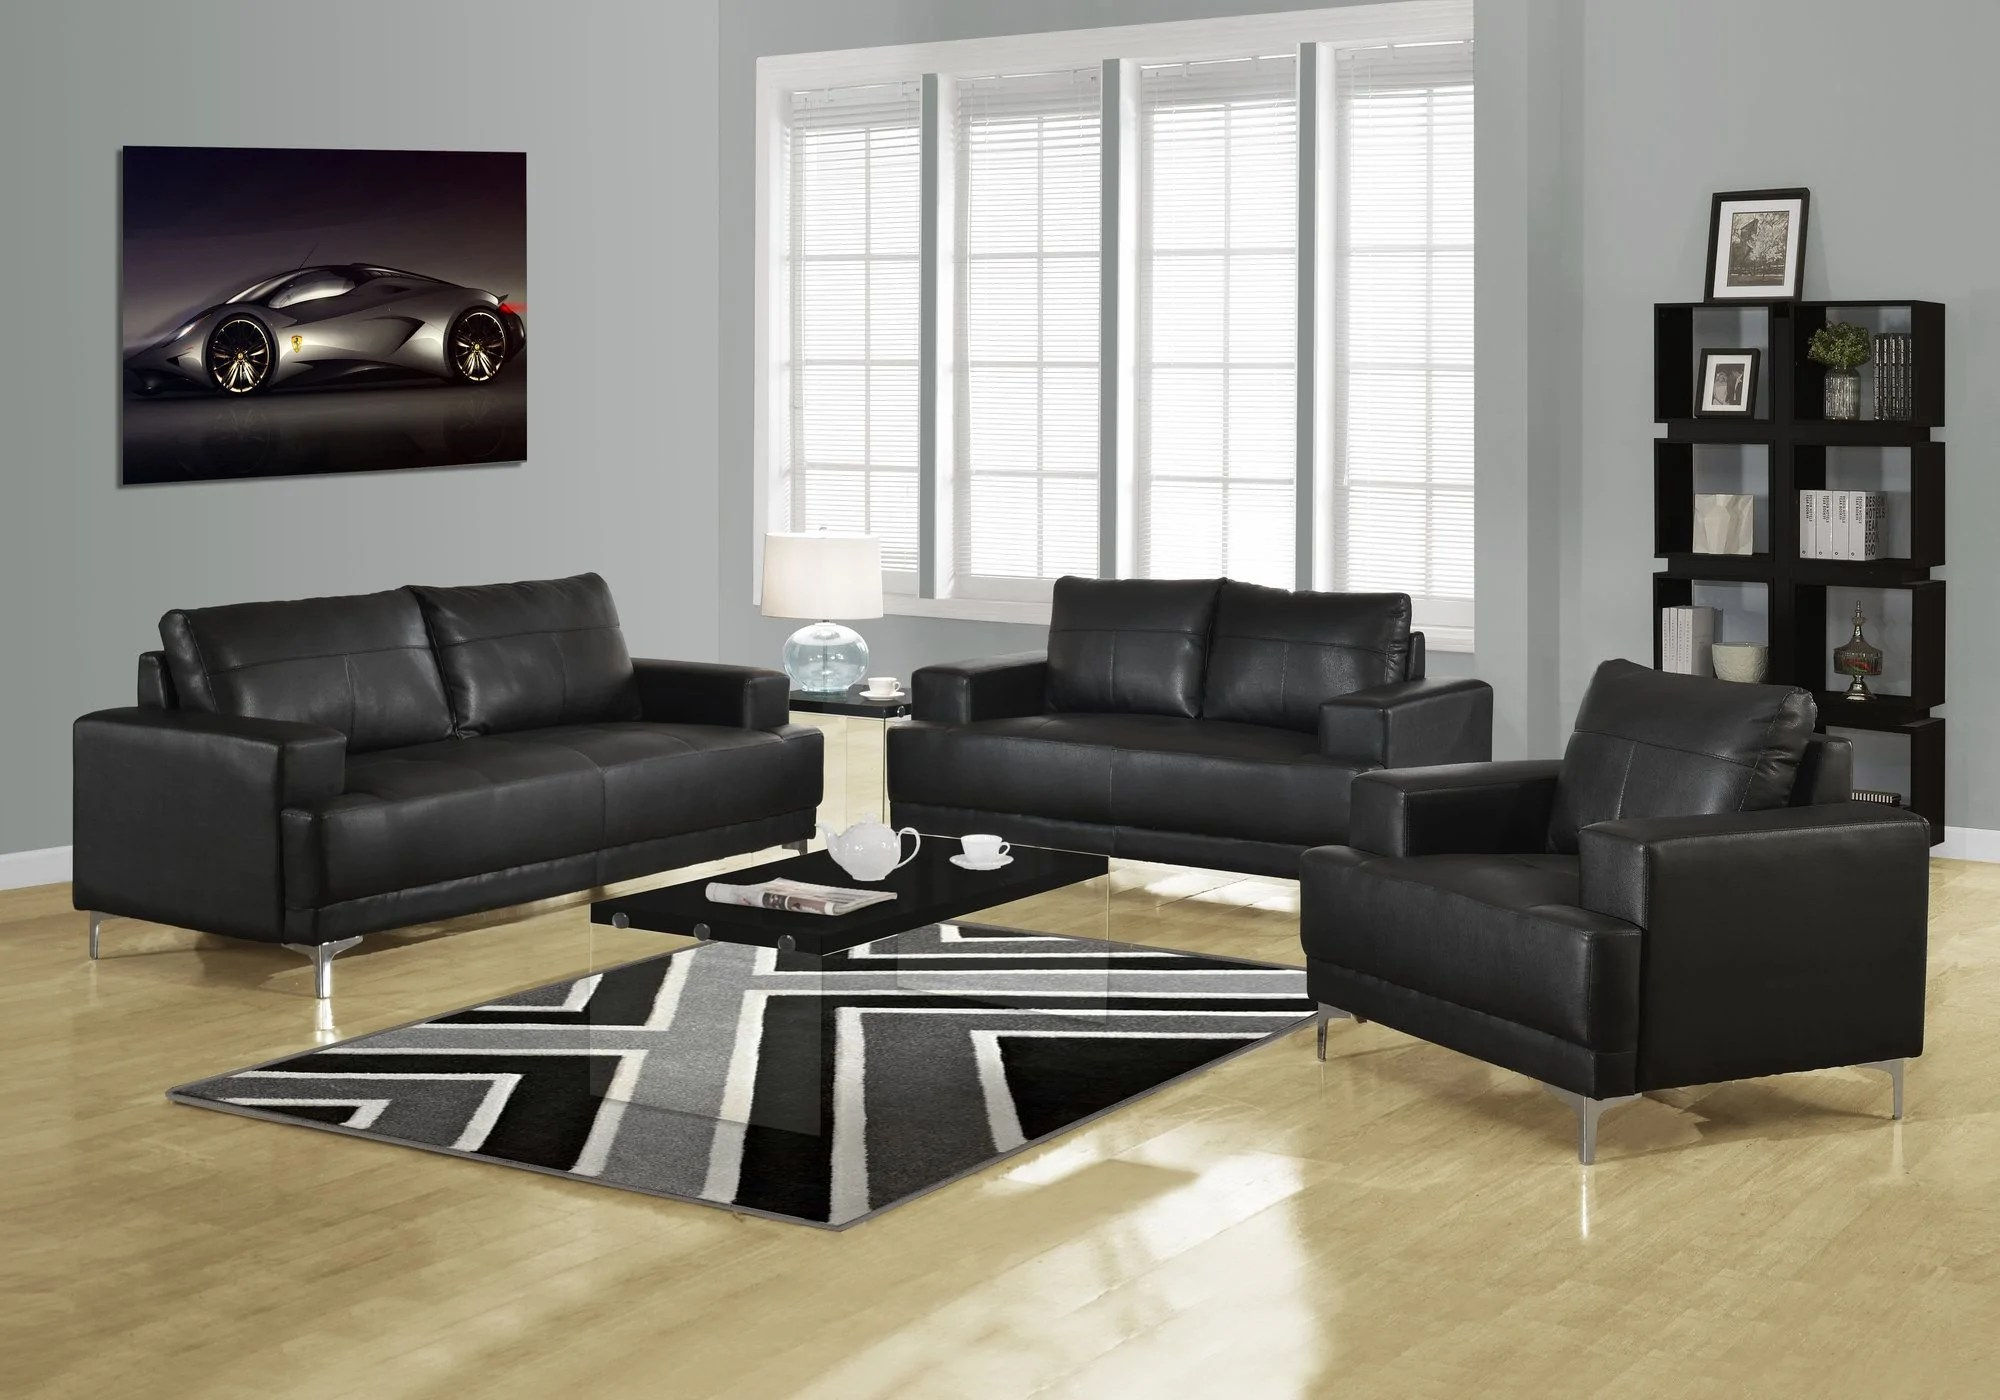 living room set leather power reclining black bonded maximum impact plus